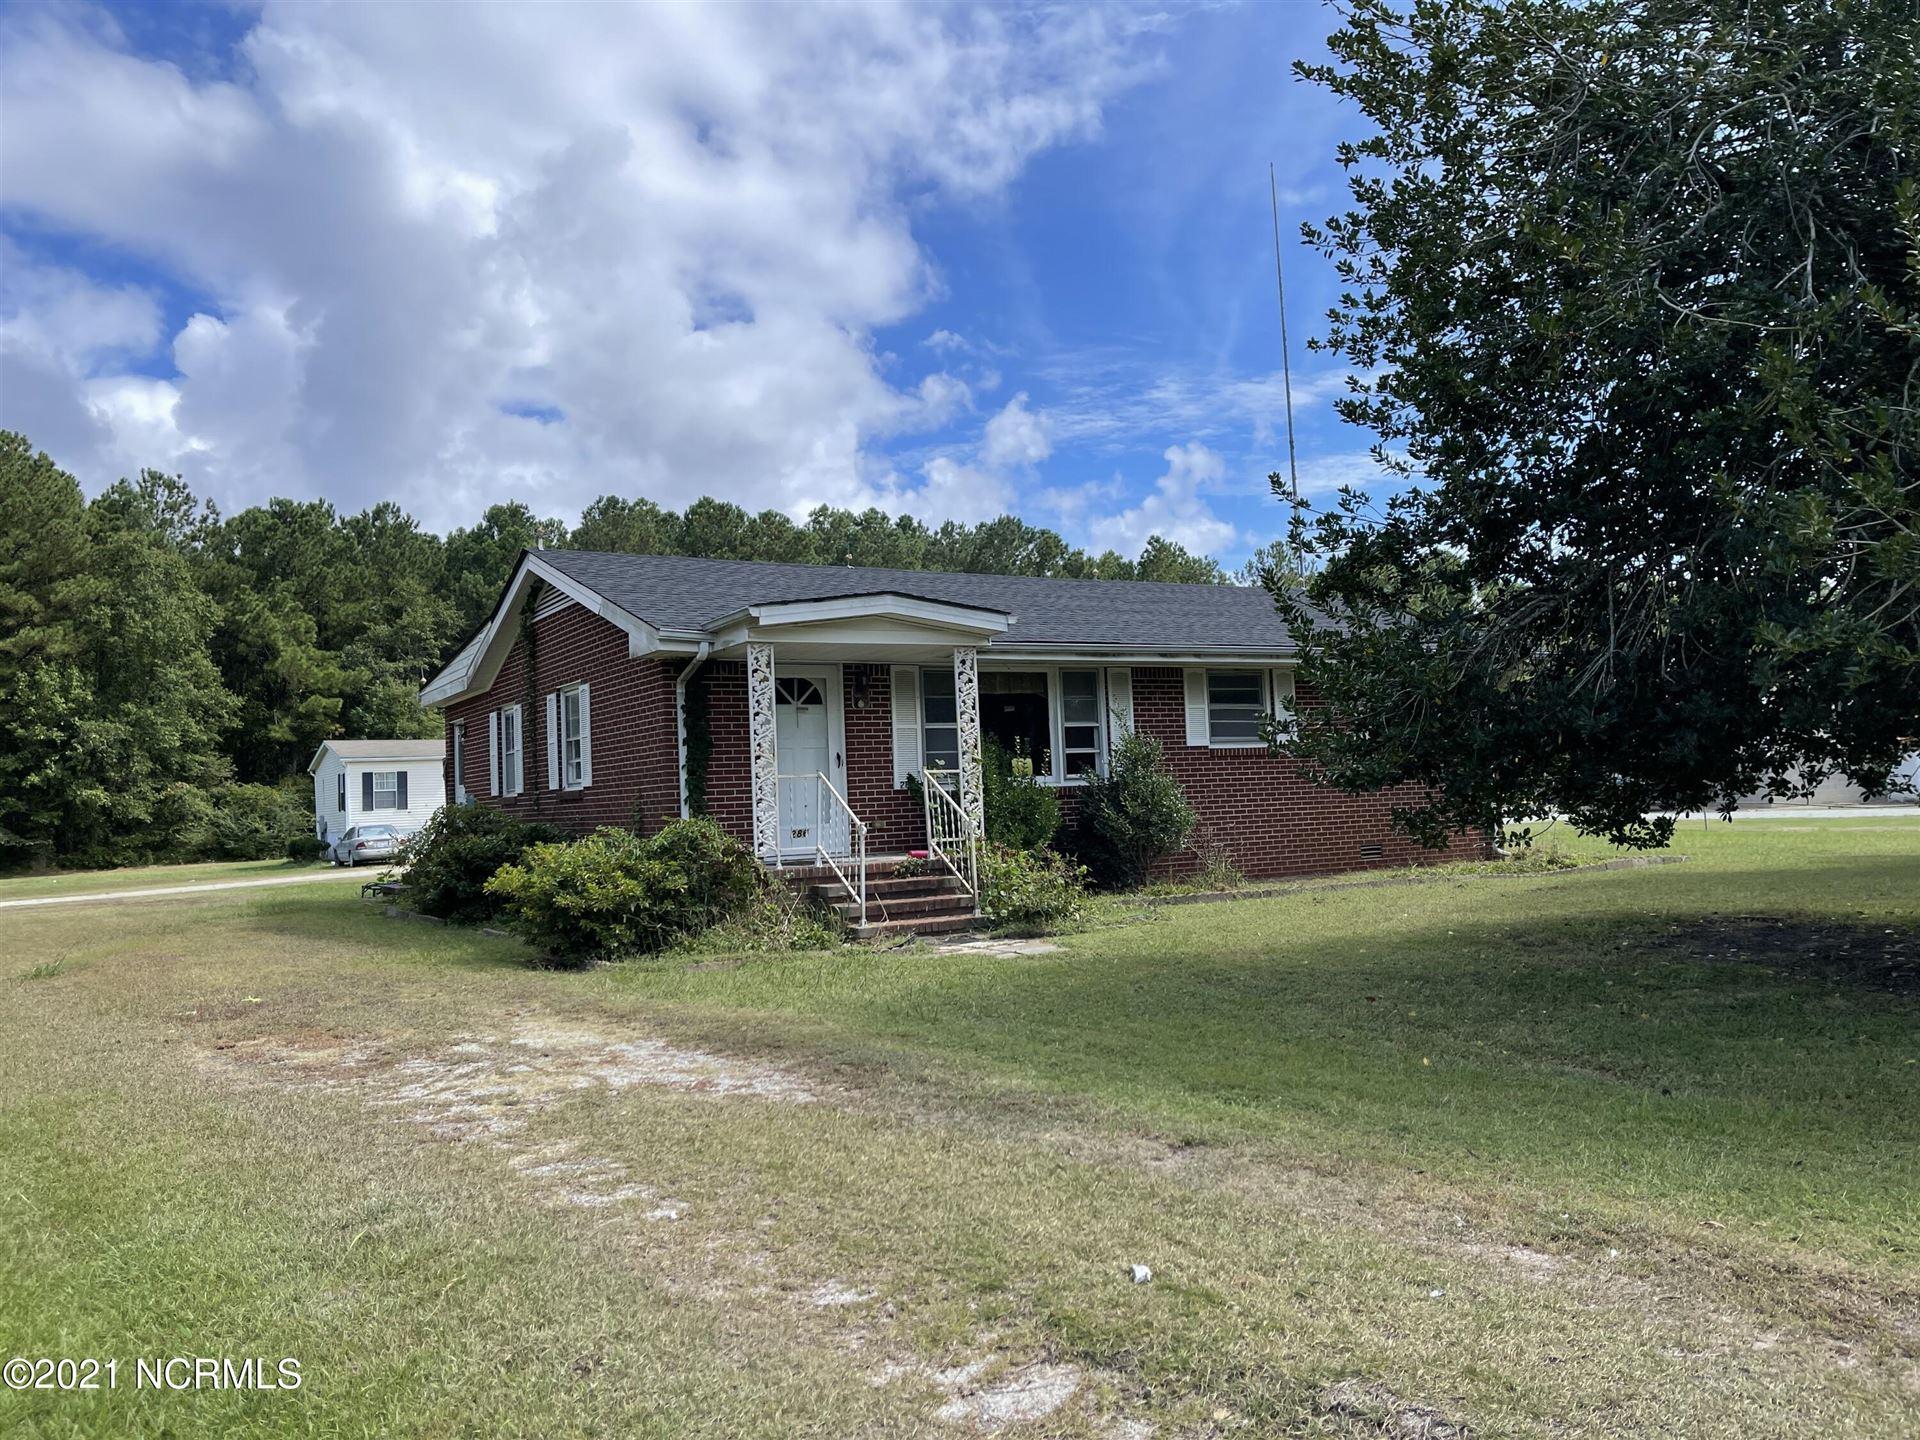 Photo of 286 Wrights Creek Road, Belhaven, NC 27810 (MLS # 100295226)